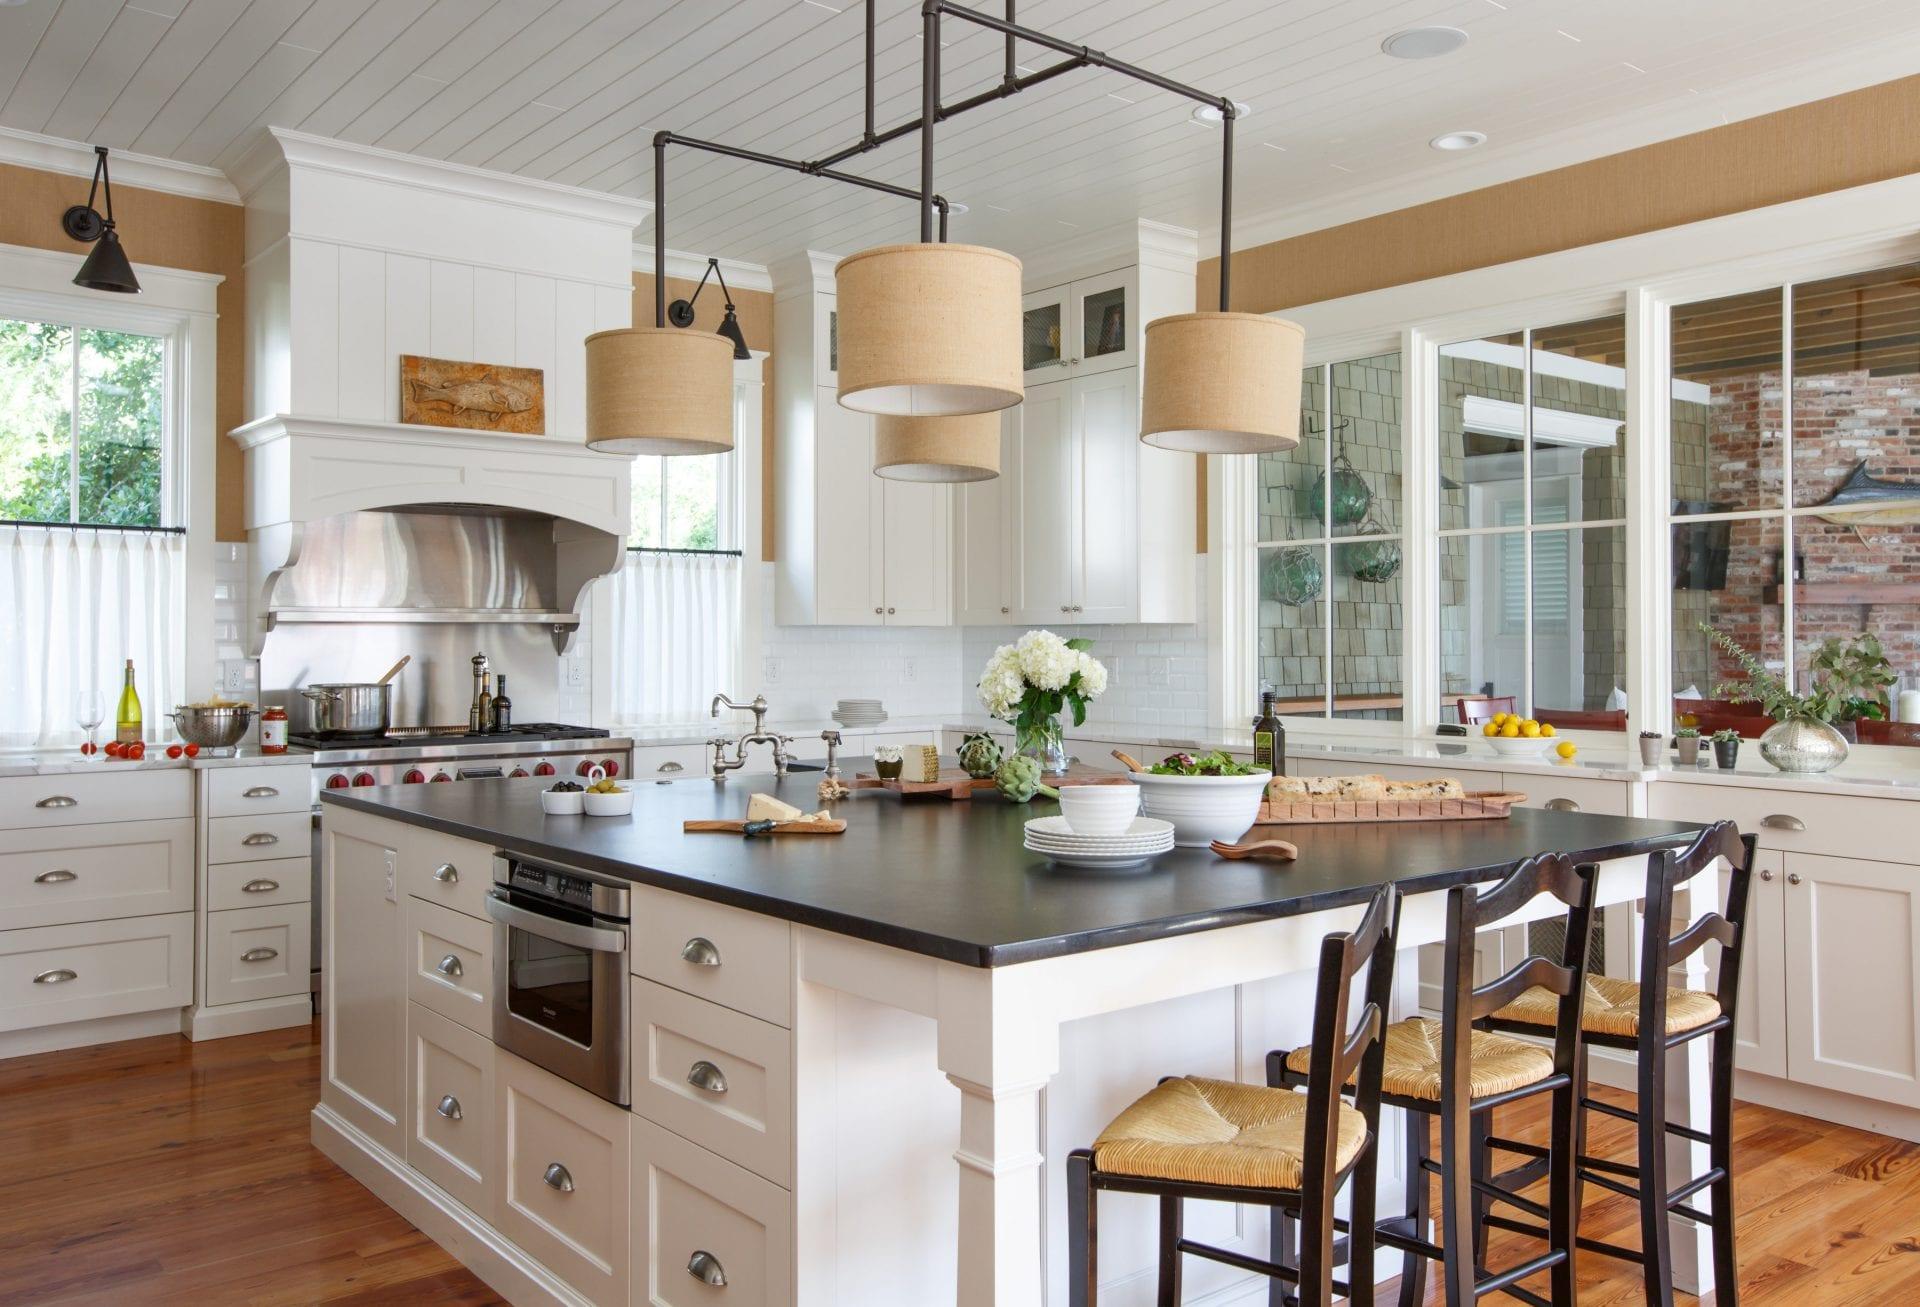 Updated kitchen from a home builder in Ponte Vedra Beach, FL